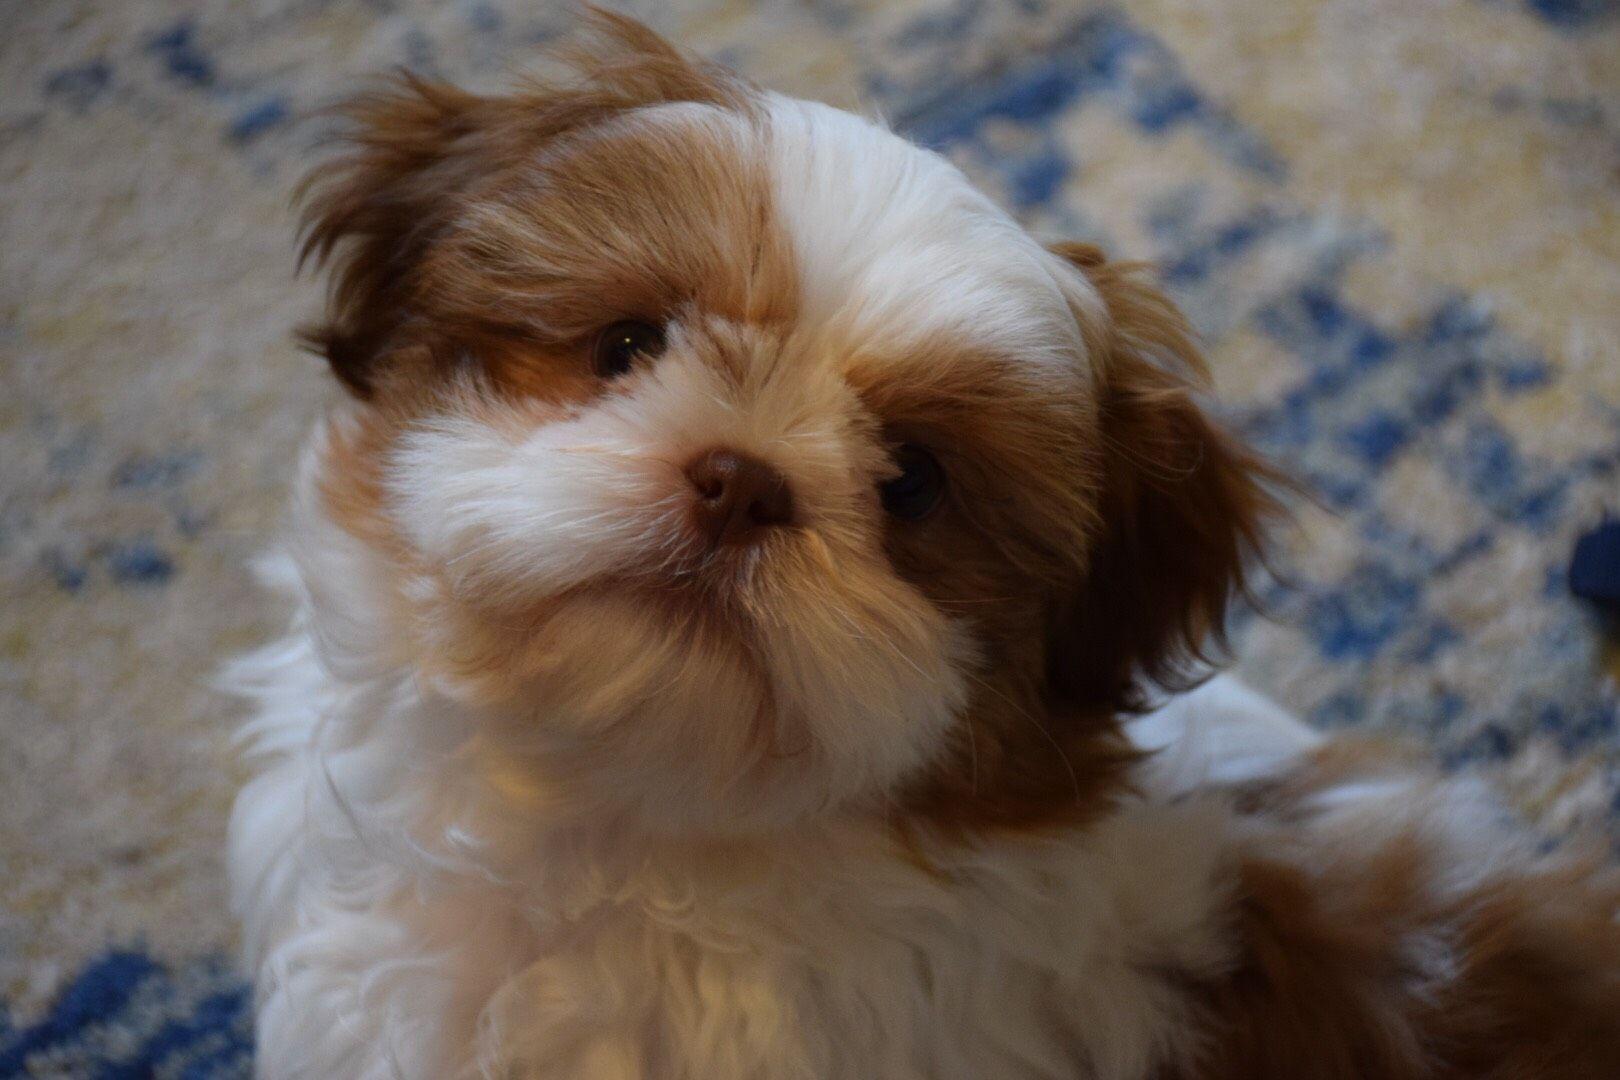 Revello Is A Red Liver Shih Tzu Puppy From Glory Ridge Shih Tzu